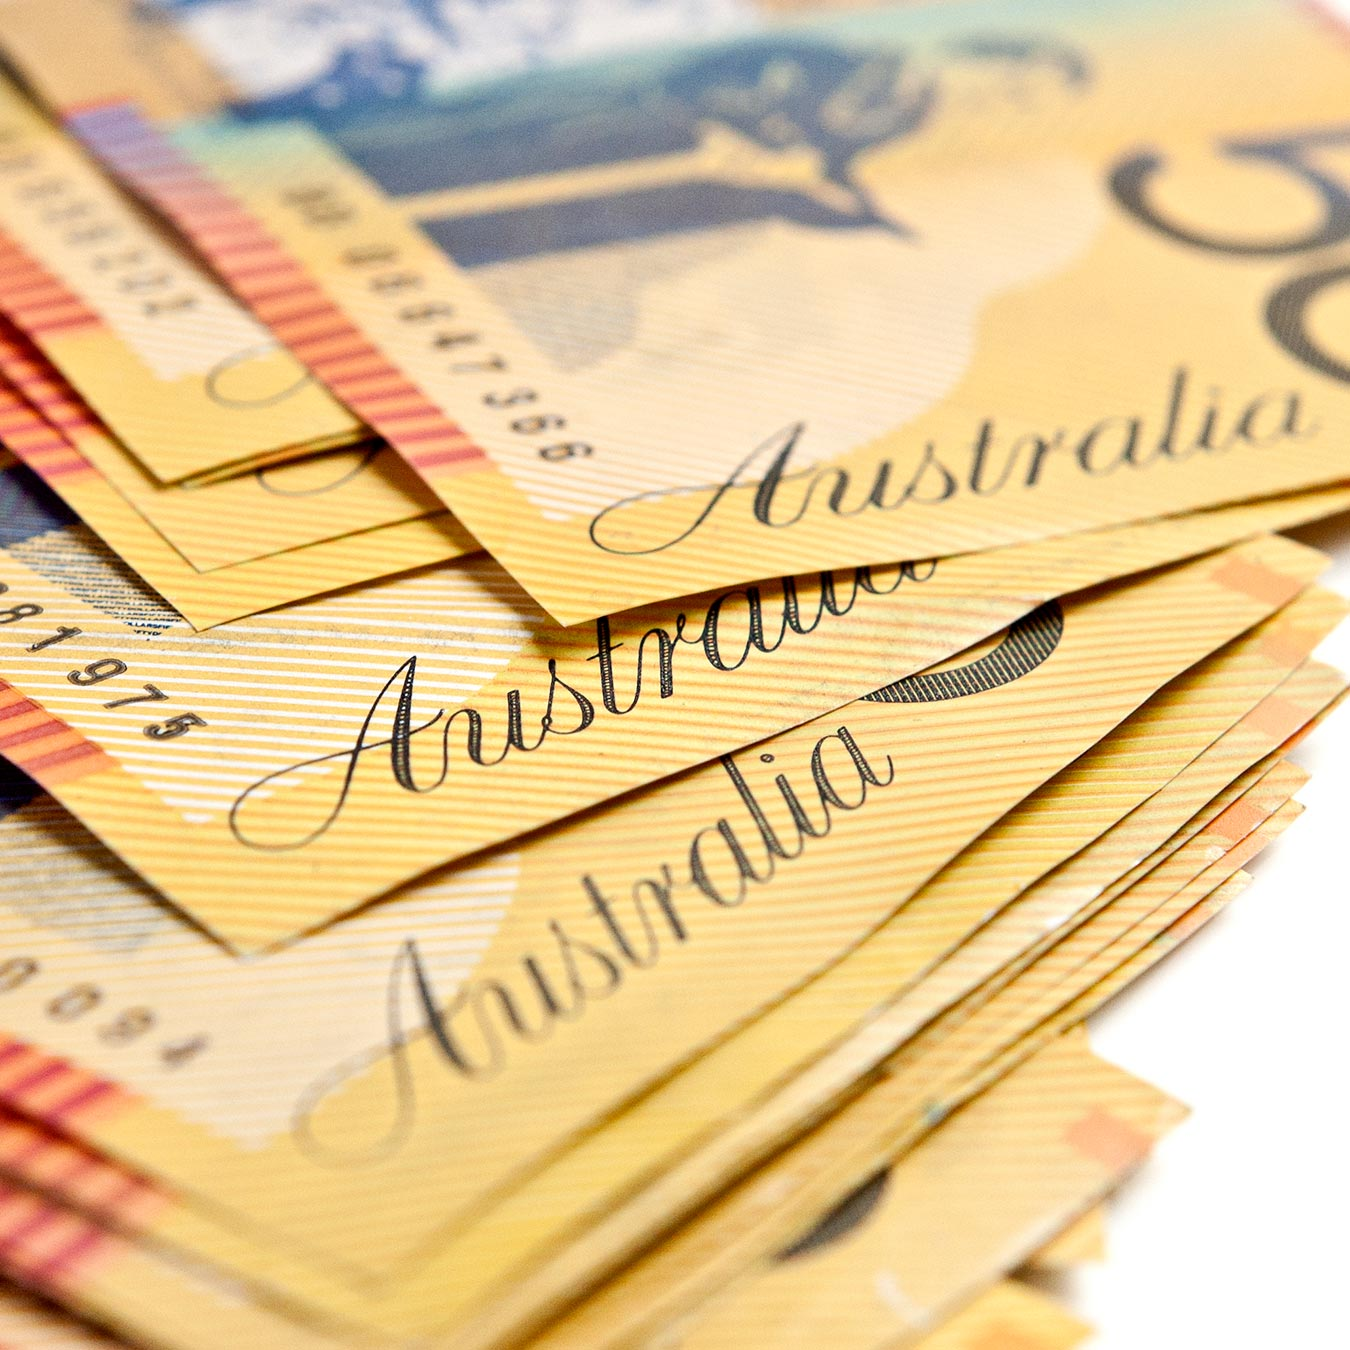 About economic education in Australia